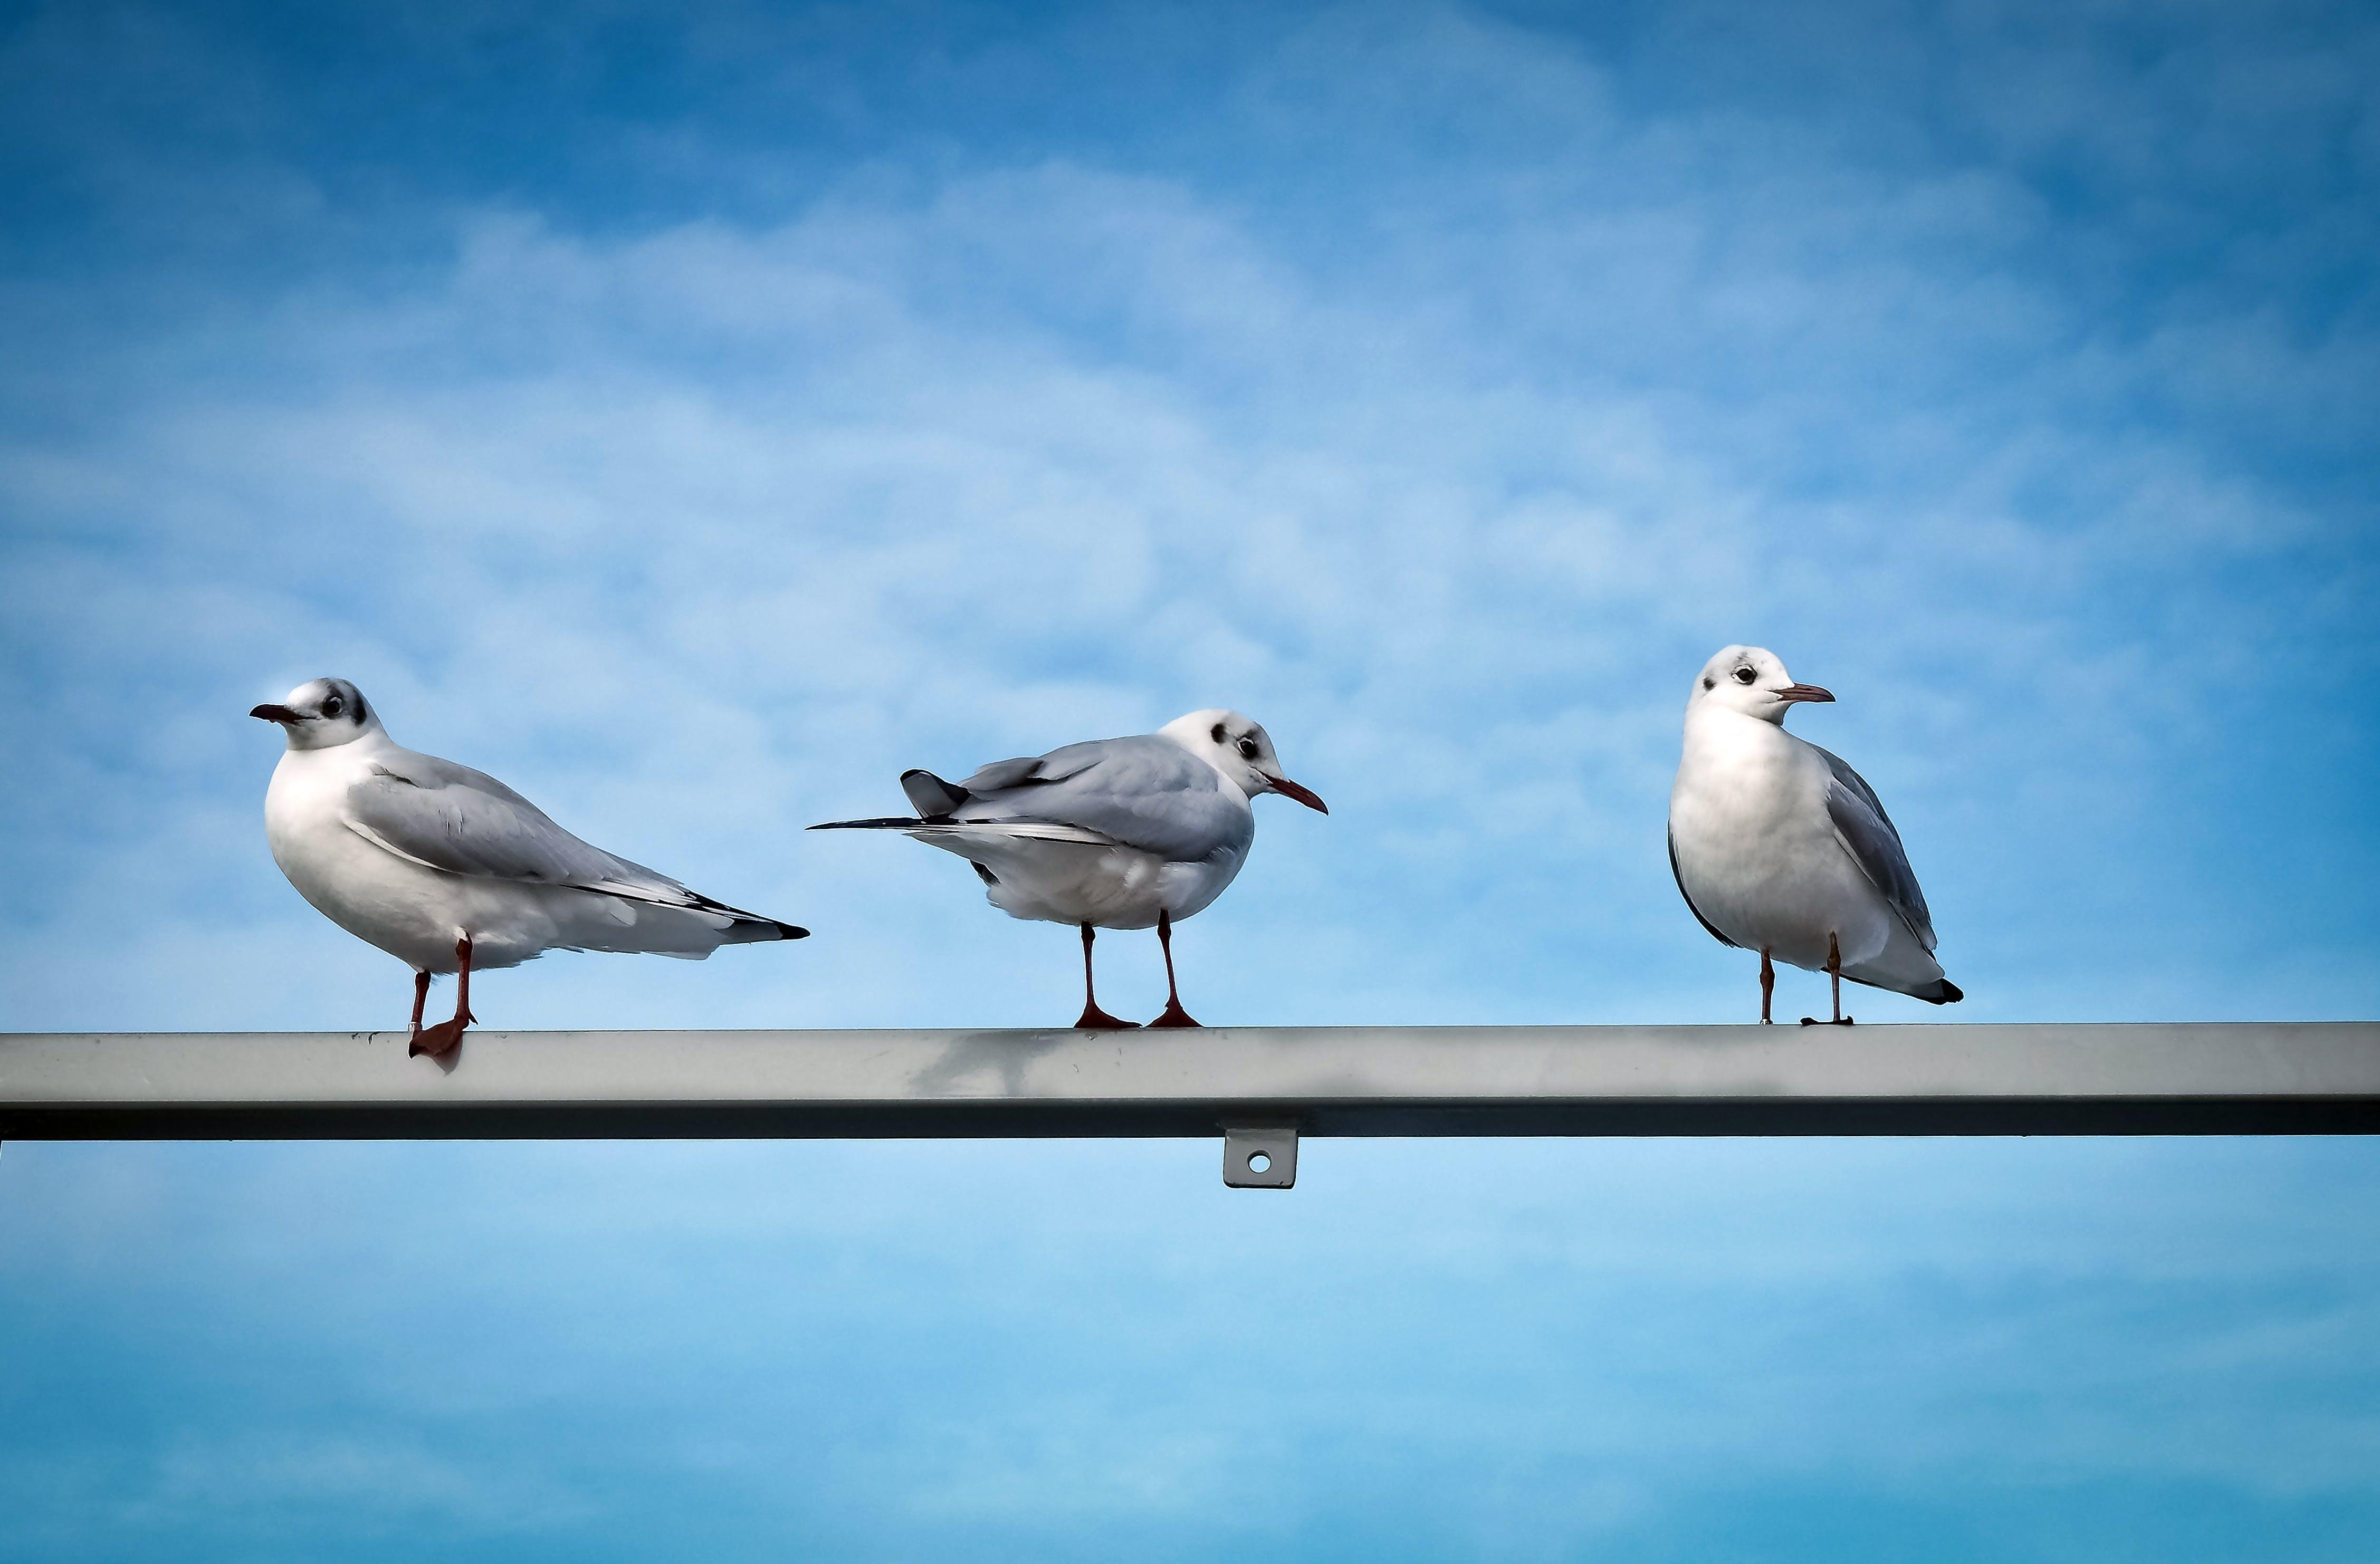 Three White Birds